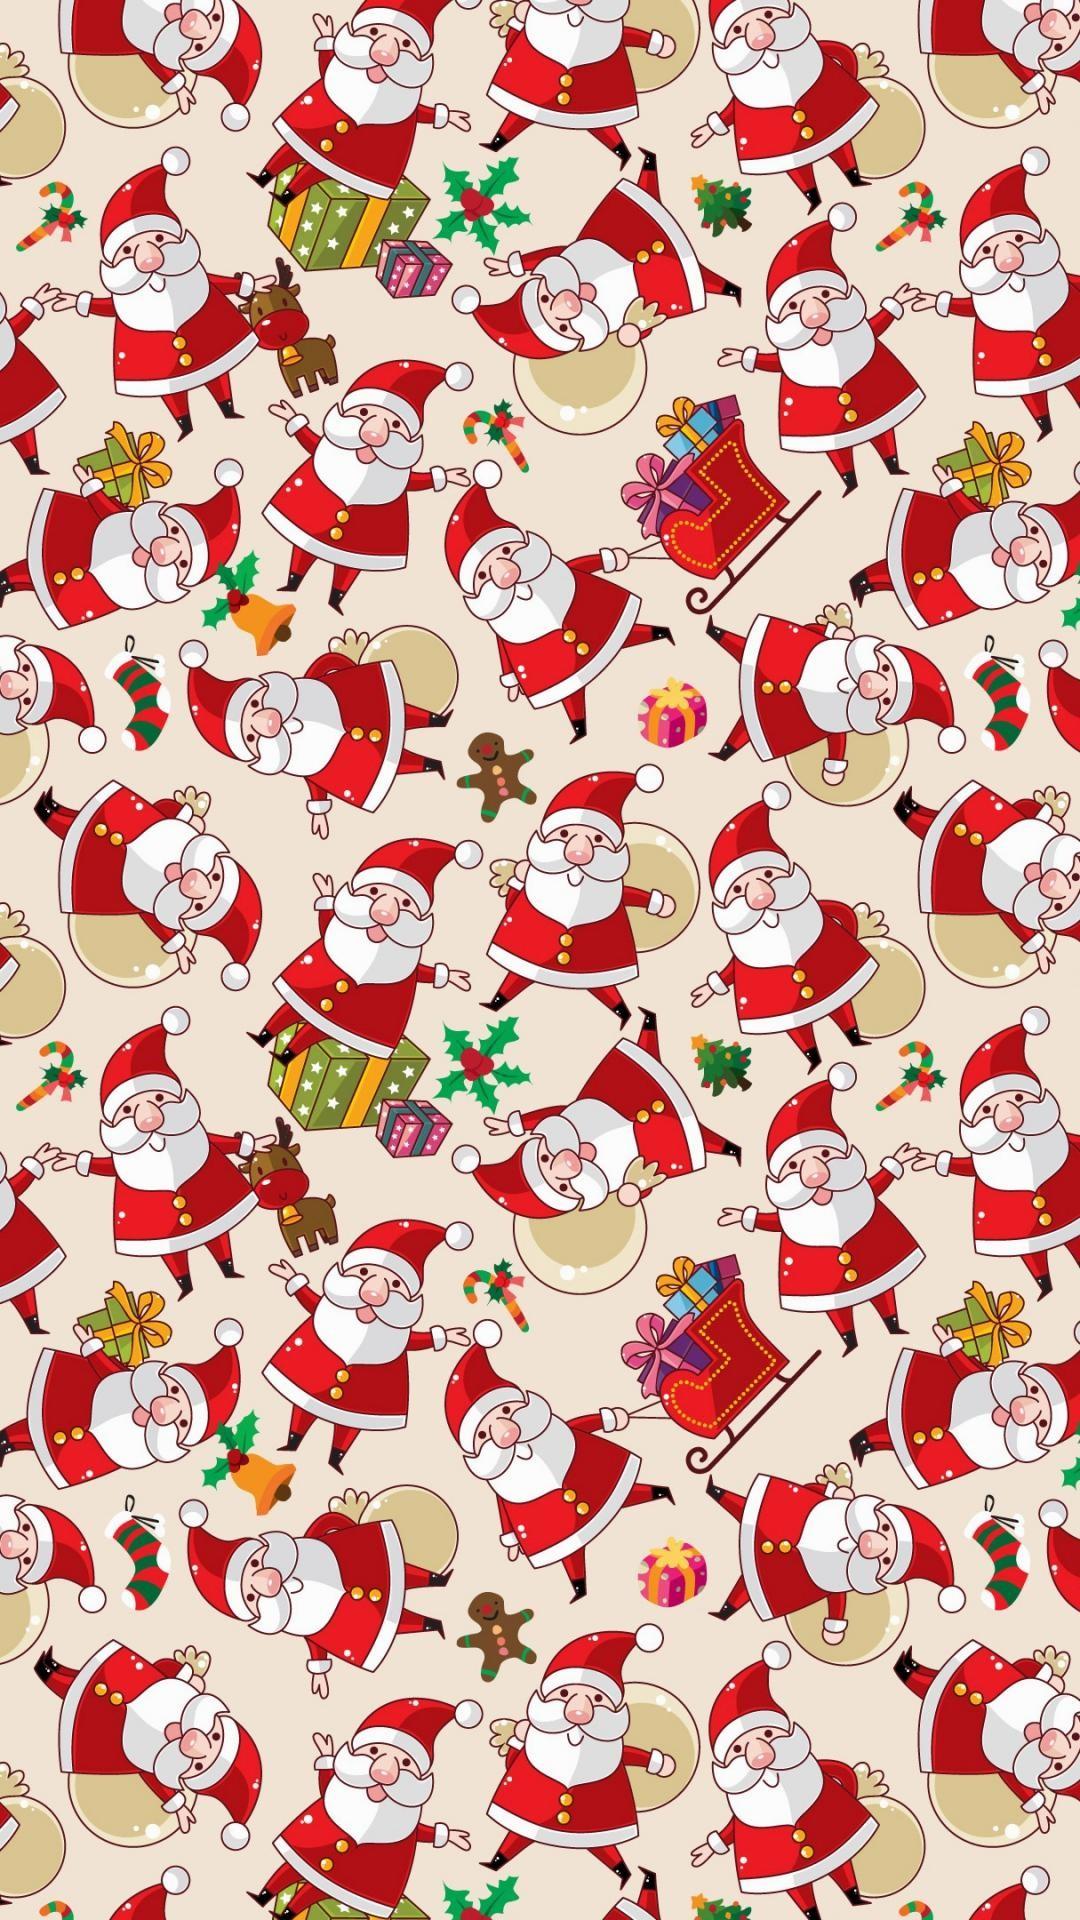 wallpaper.wiki-Santa-Claus-Pattern-Texture-Background-iphone-